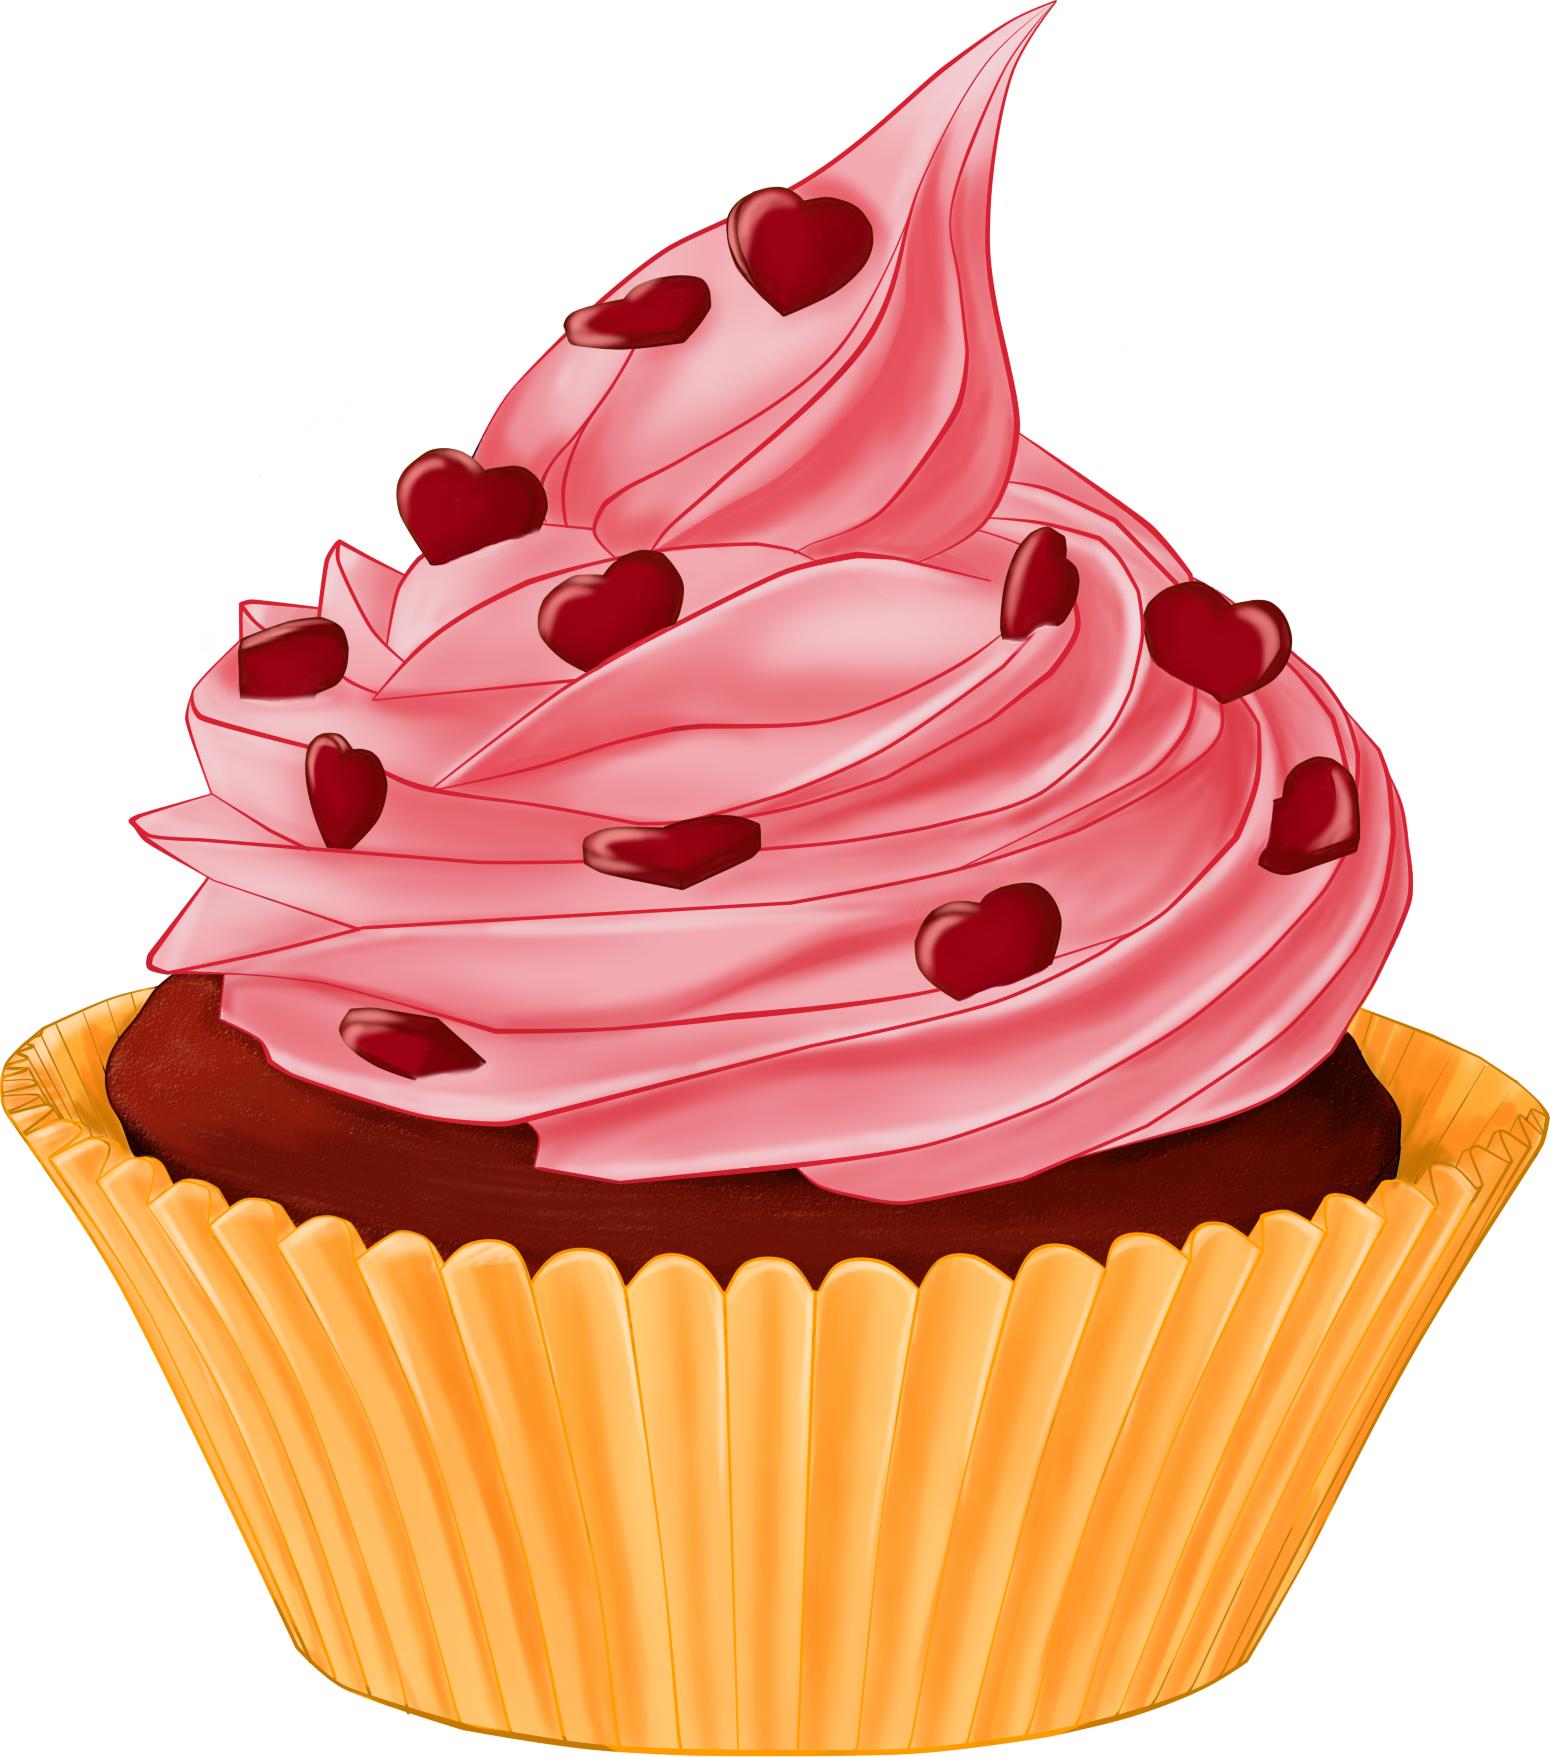 Png hd transparent images. Desserts clipart cupcake